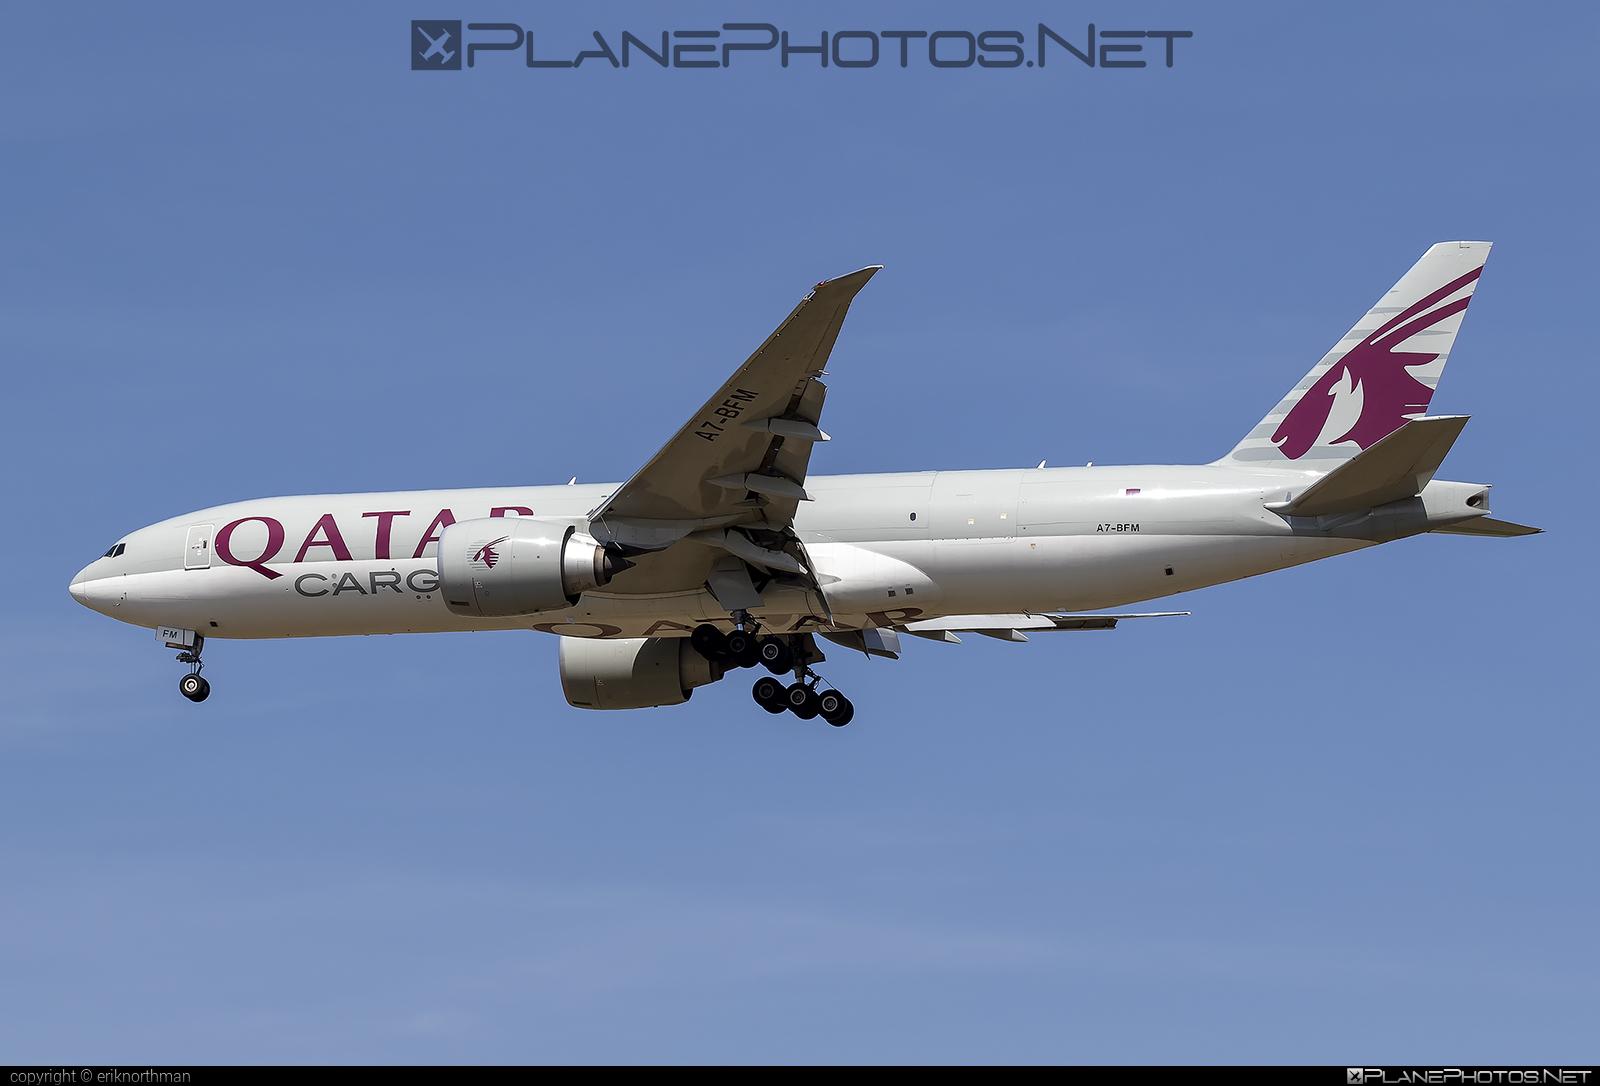 Boeing 777F - A7-BFM operated by Qatar Airways Cargo #b777 #b777f #b777freighter #boeing #boeing777 #qatarairwayscargo #tripleseven